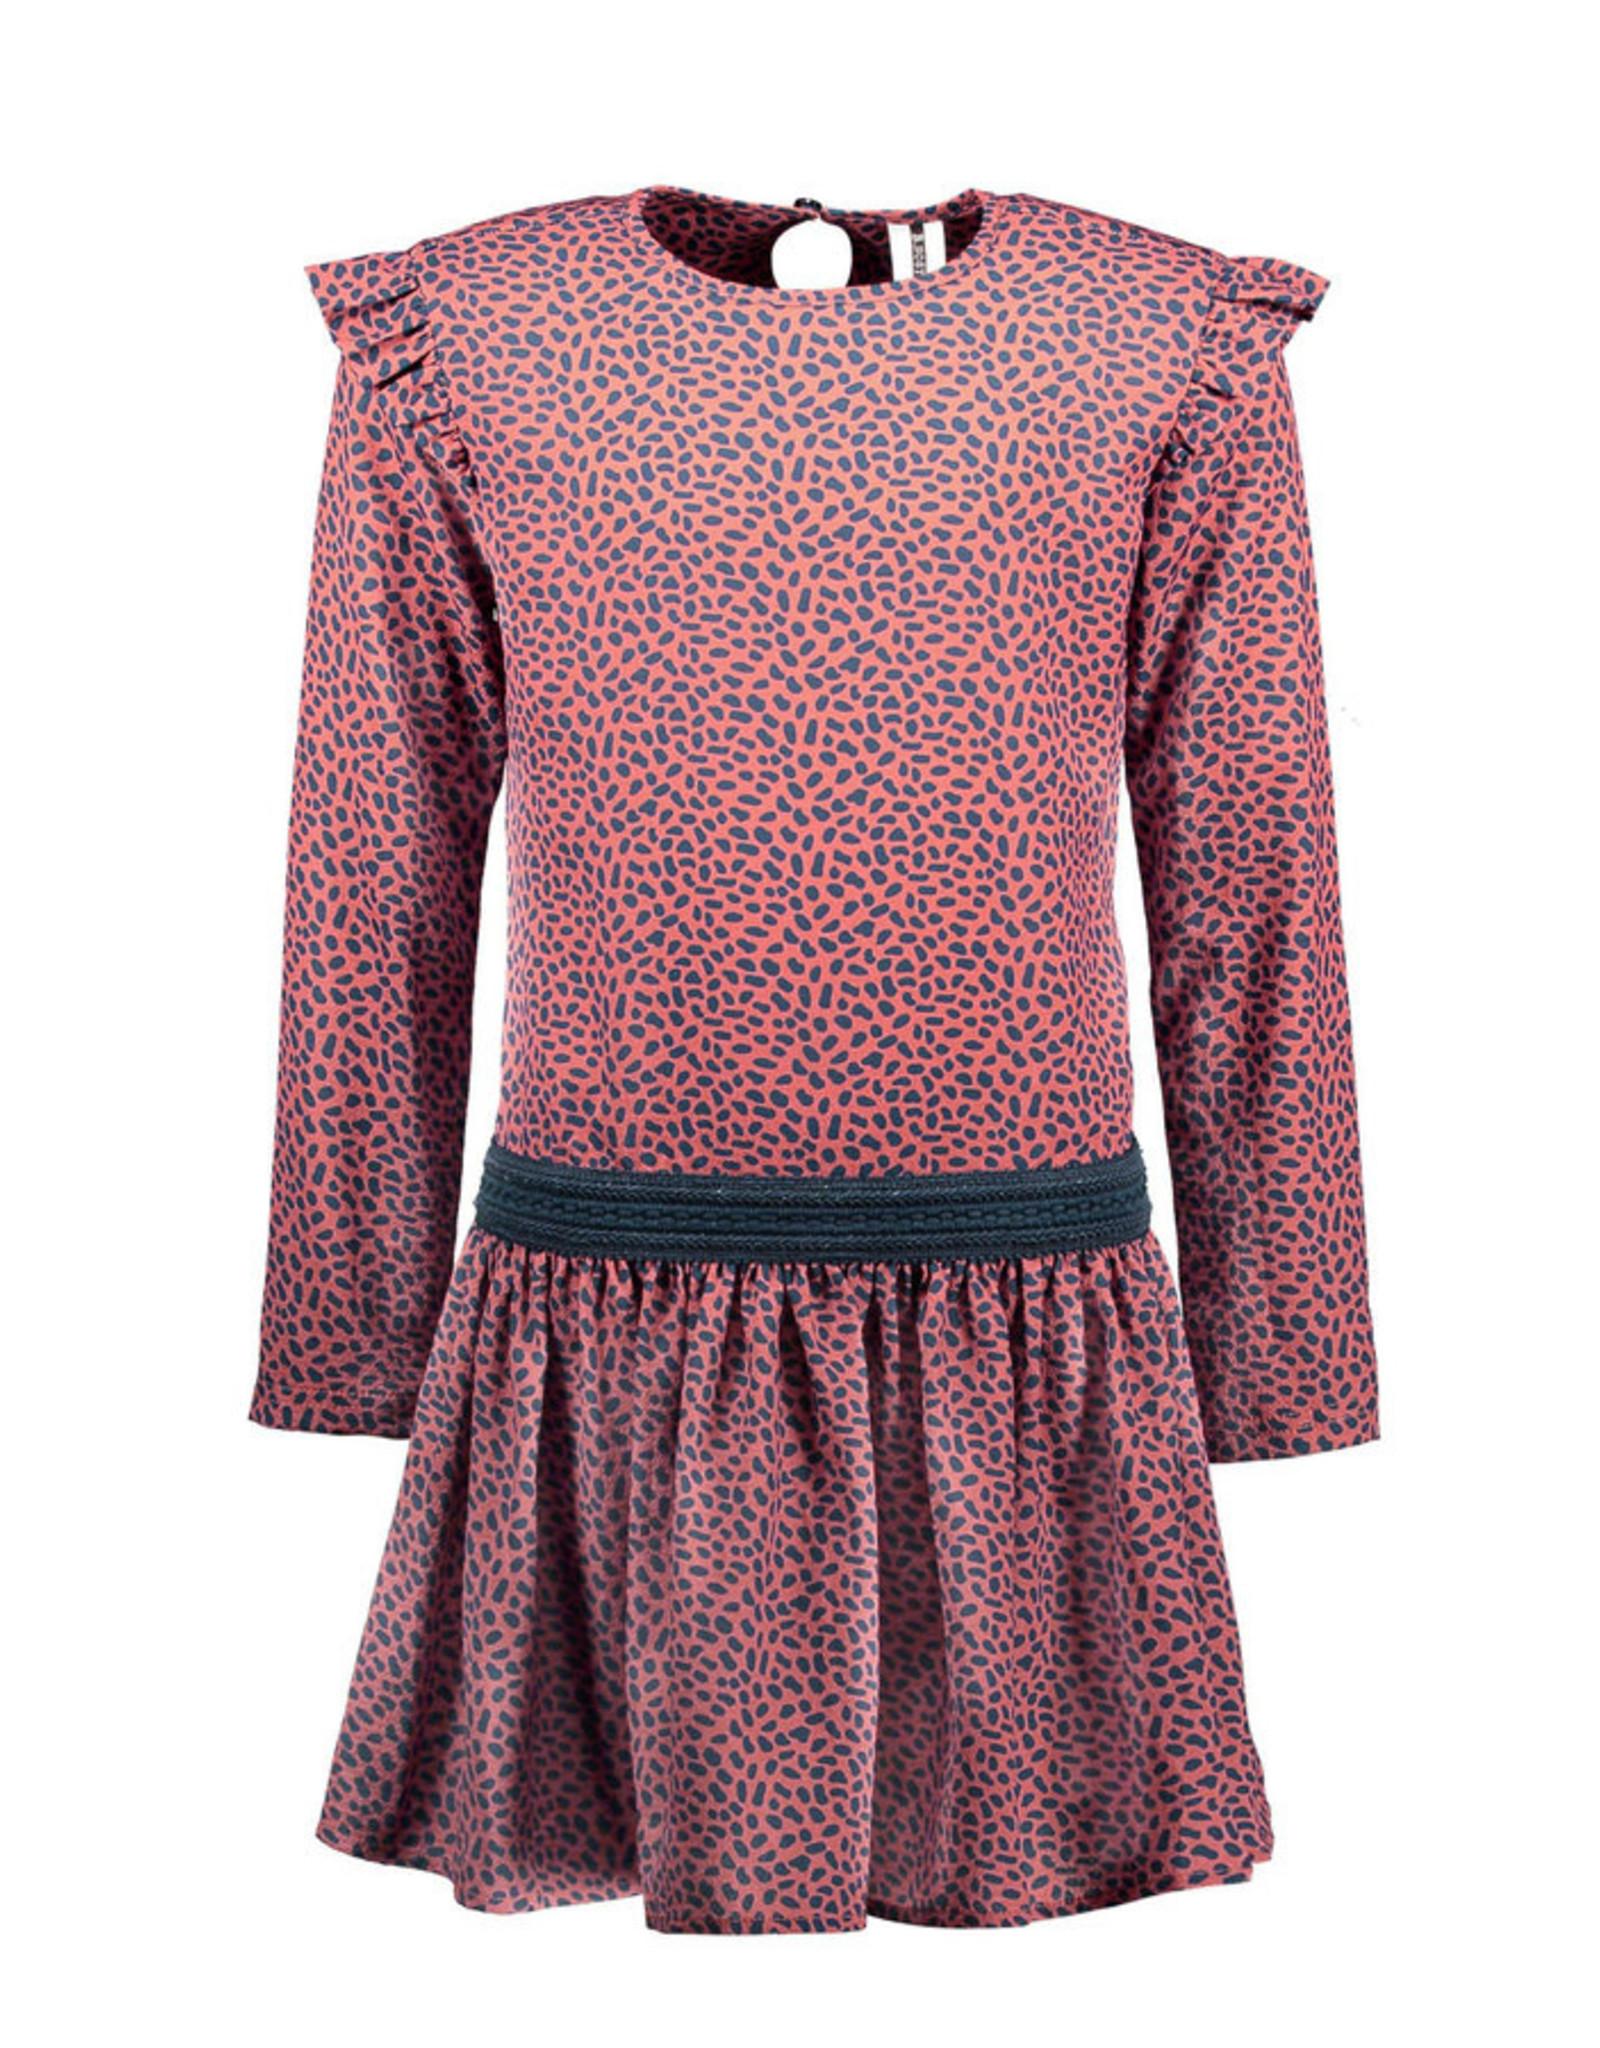 B.Nosy B.Nosy Girls Woven Dress Mix Dots all over print